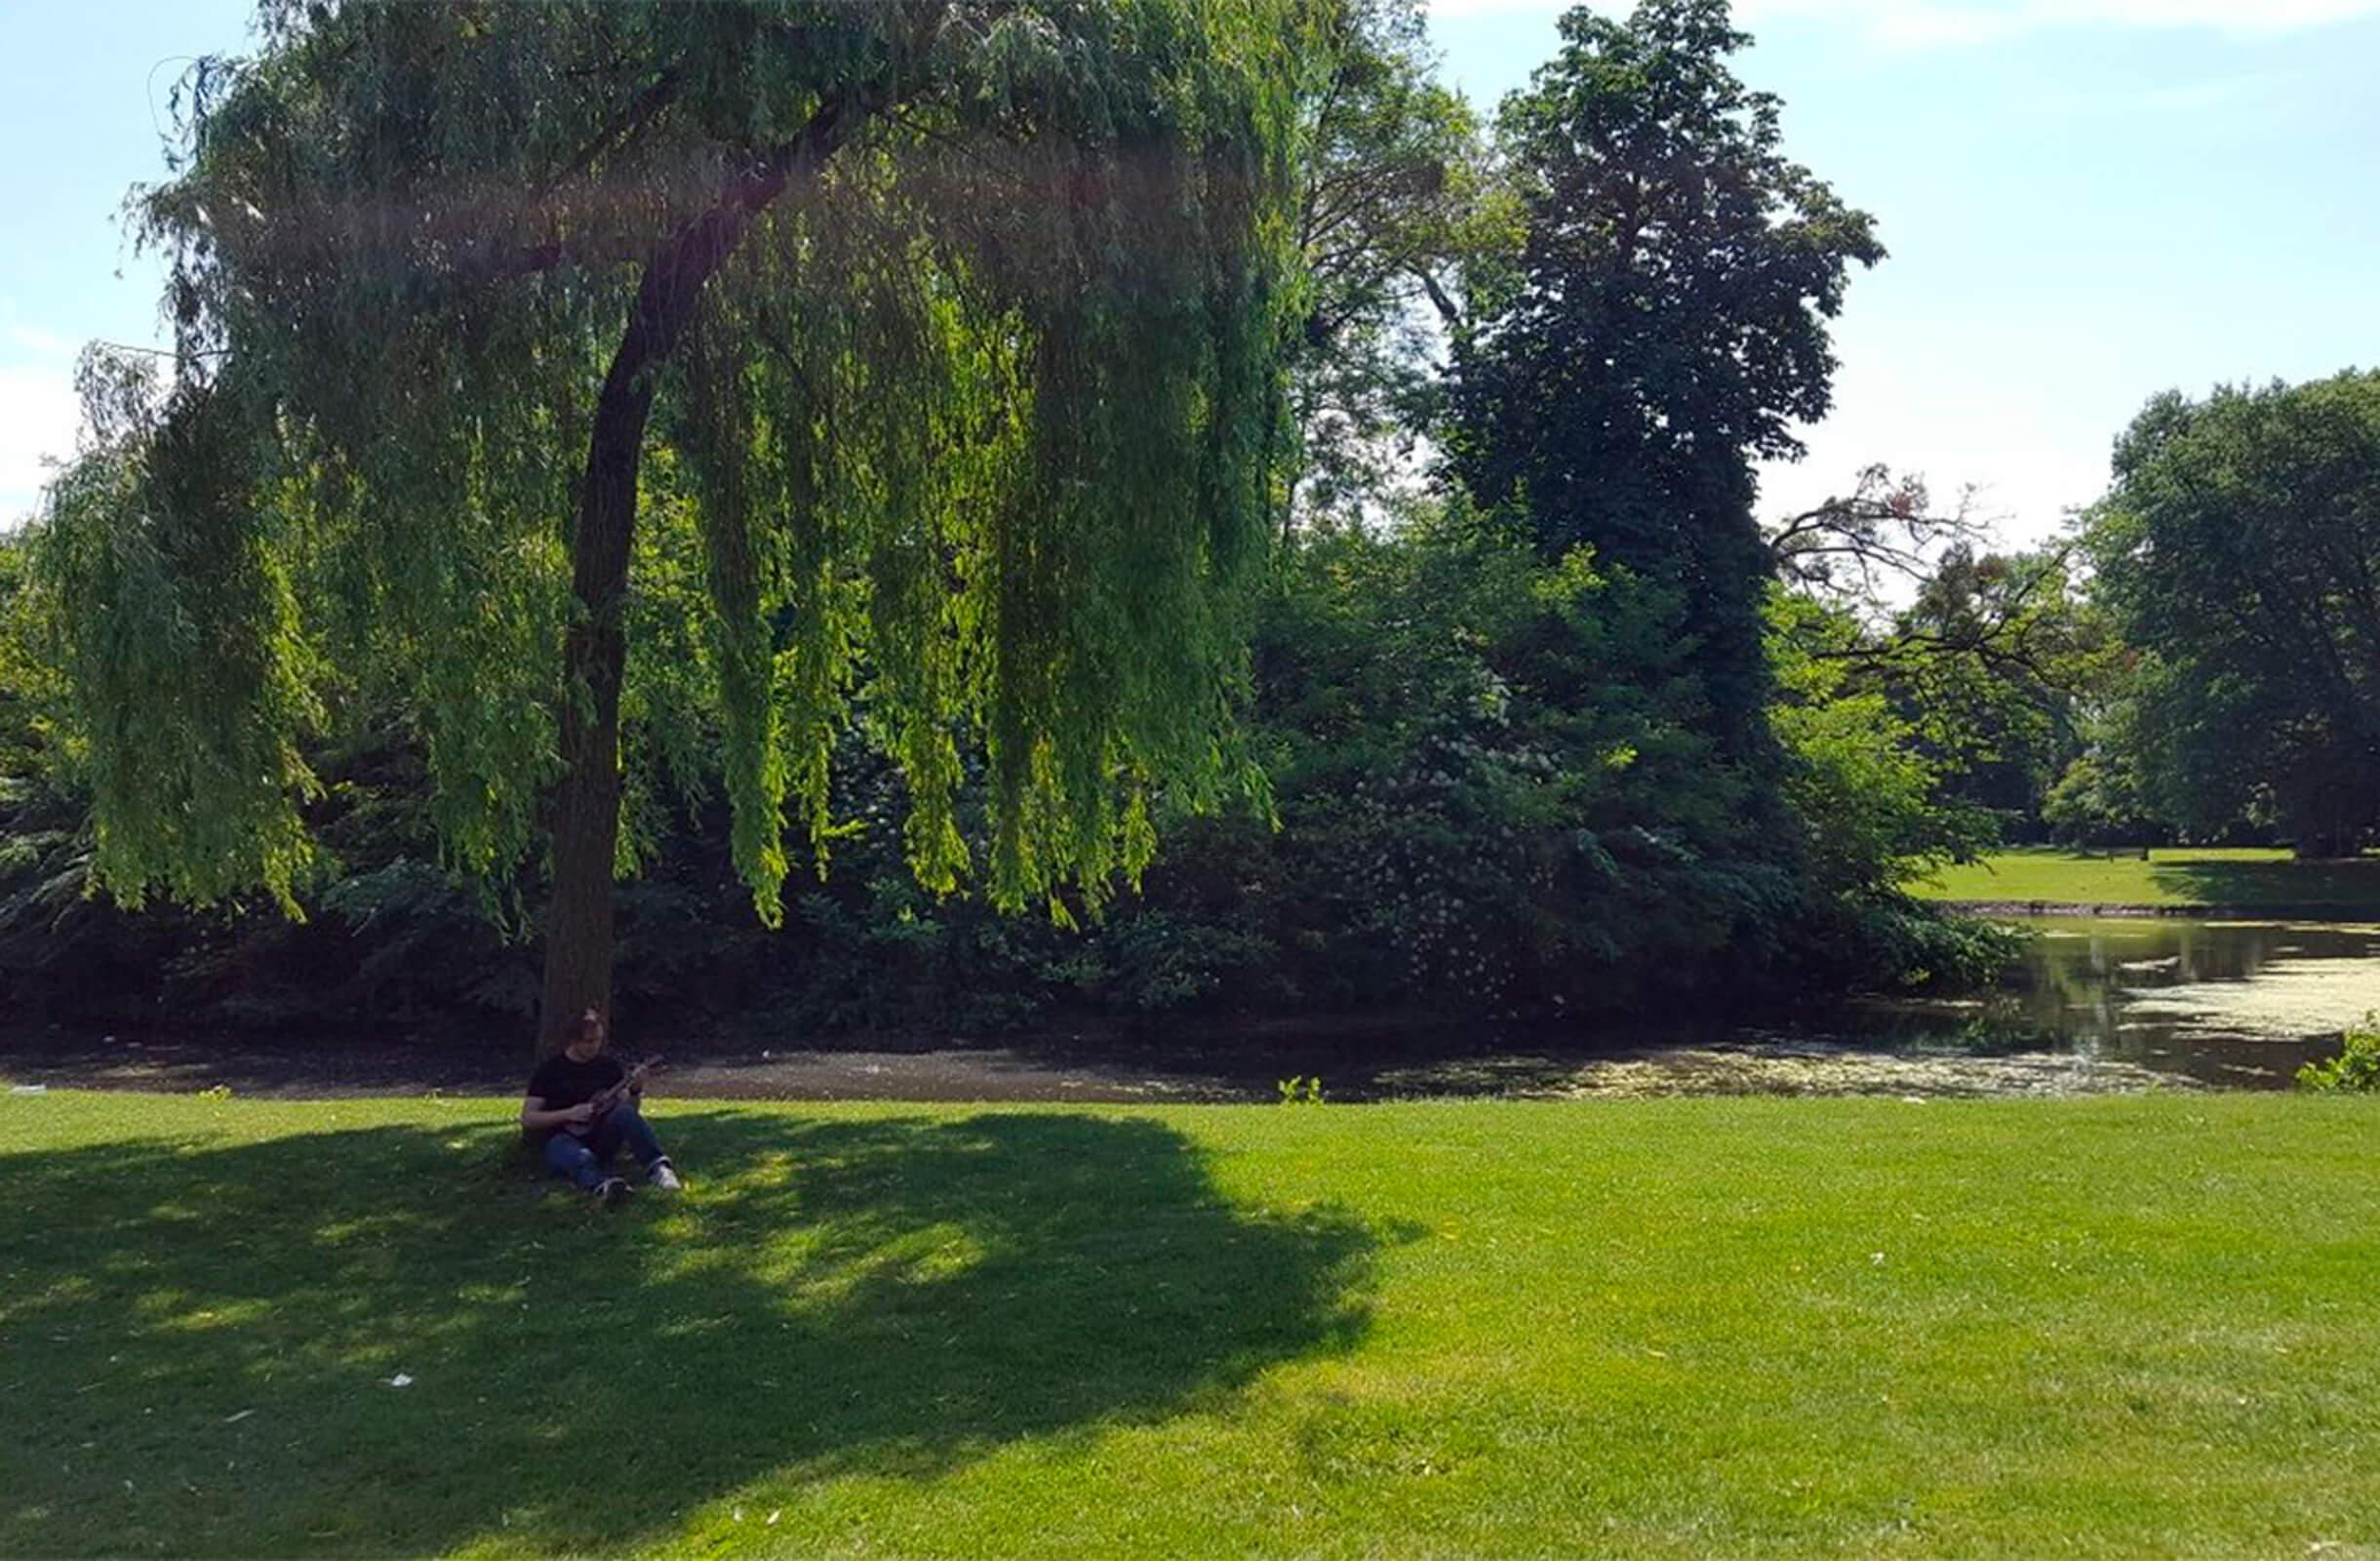 Парк, в который мы часто ходим летом